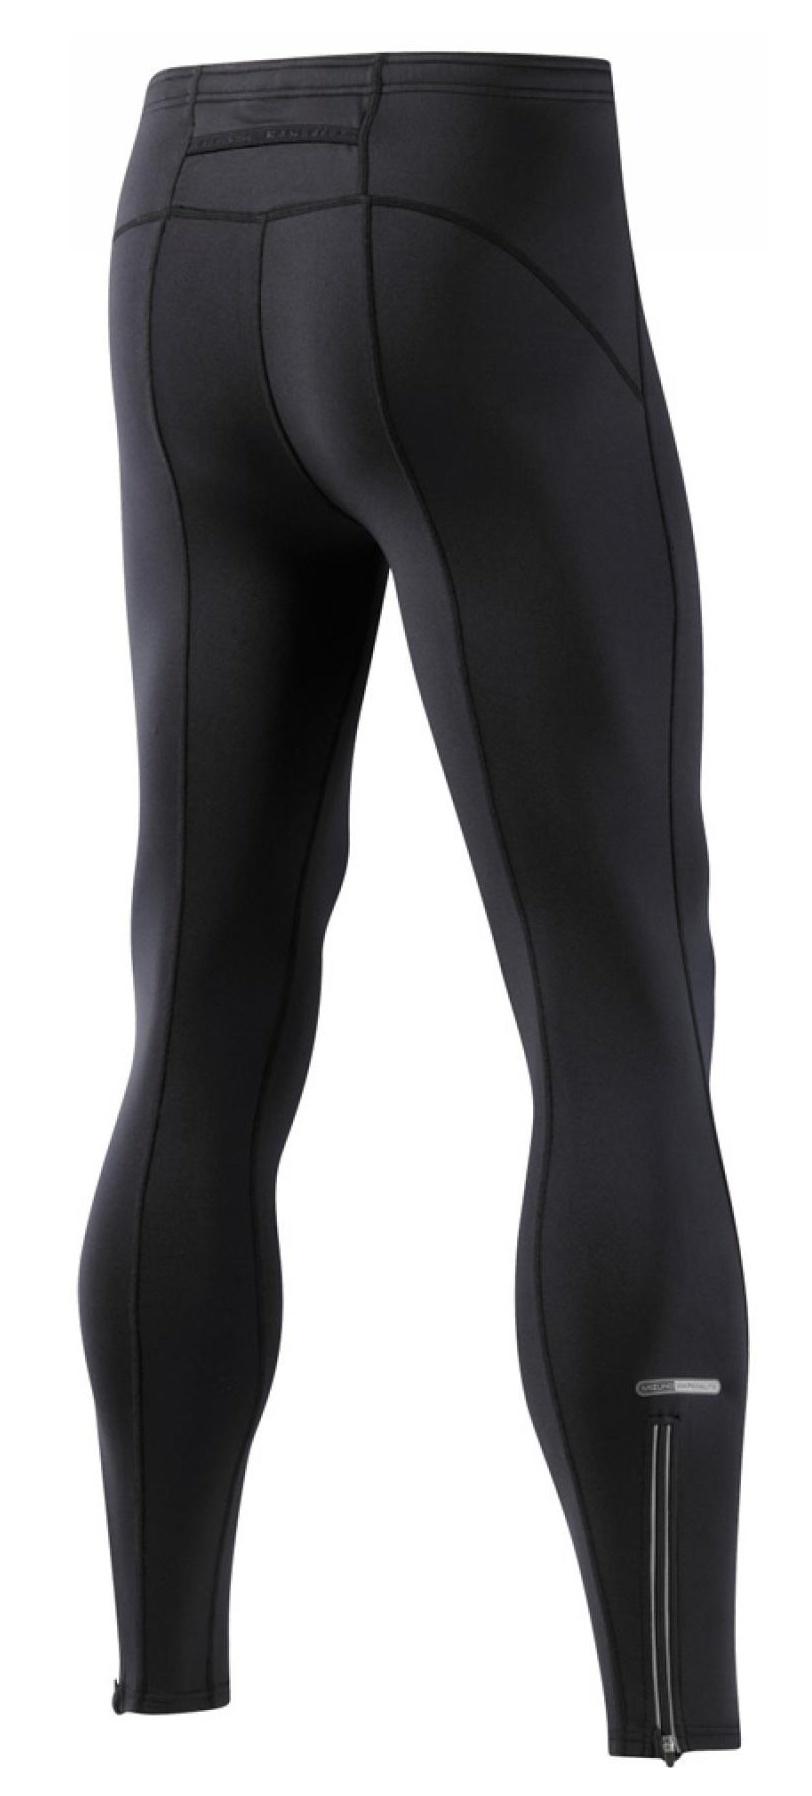 Мужские тайтсы Mizuno Warmalite Long Tights black (67RT370 09) фото